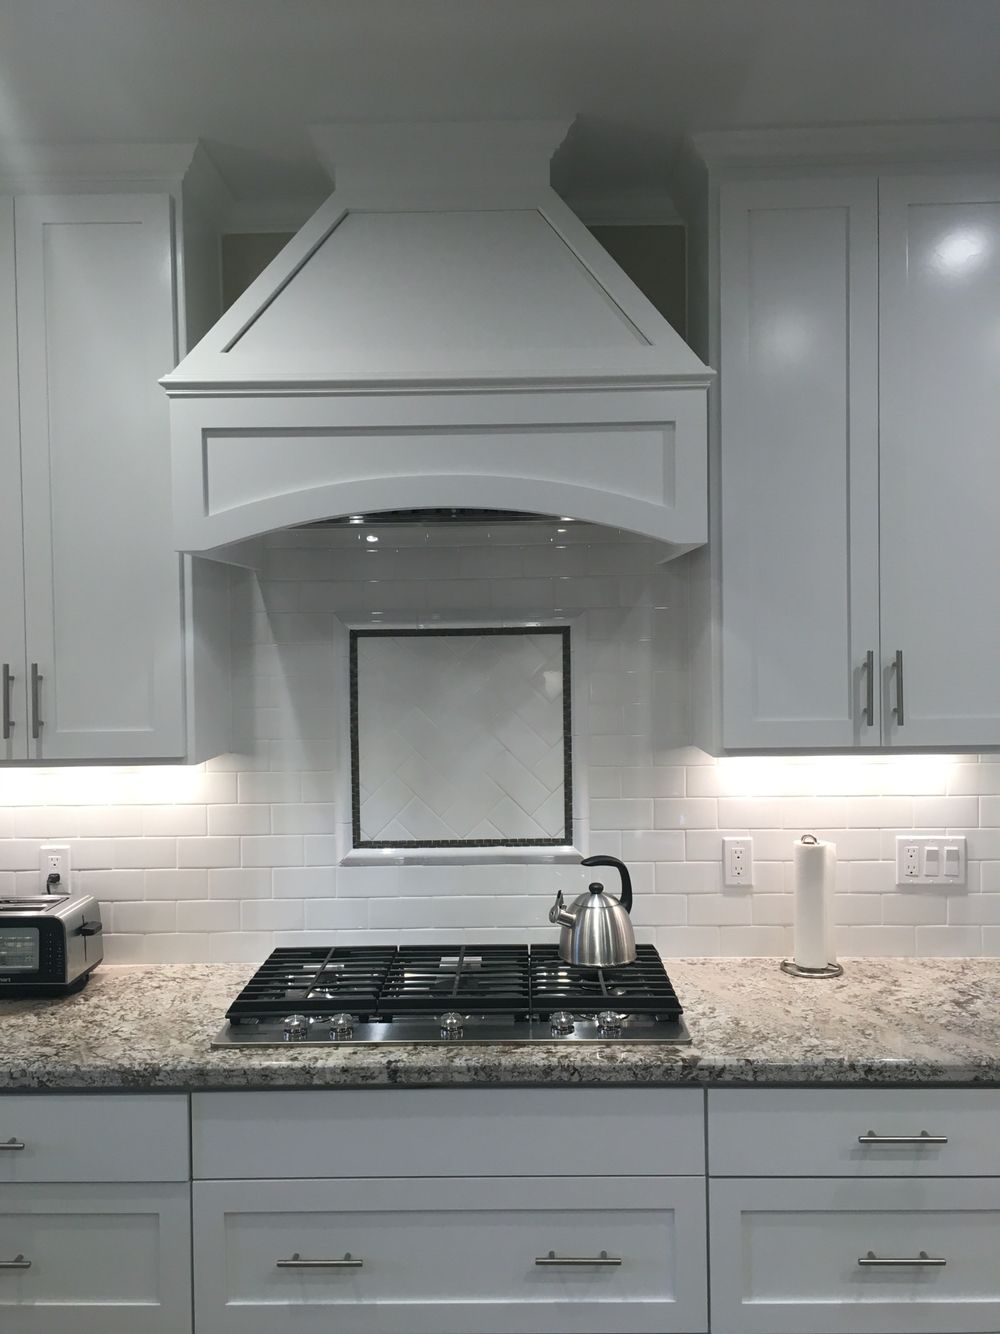 white kitchen. Backsplash stove design. Bianco Antico granite with subway tile backsplash.